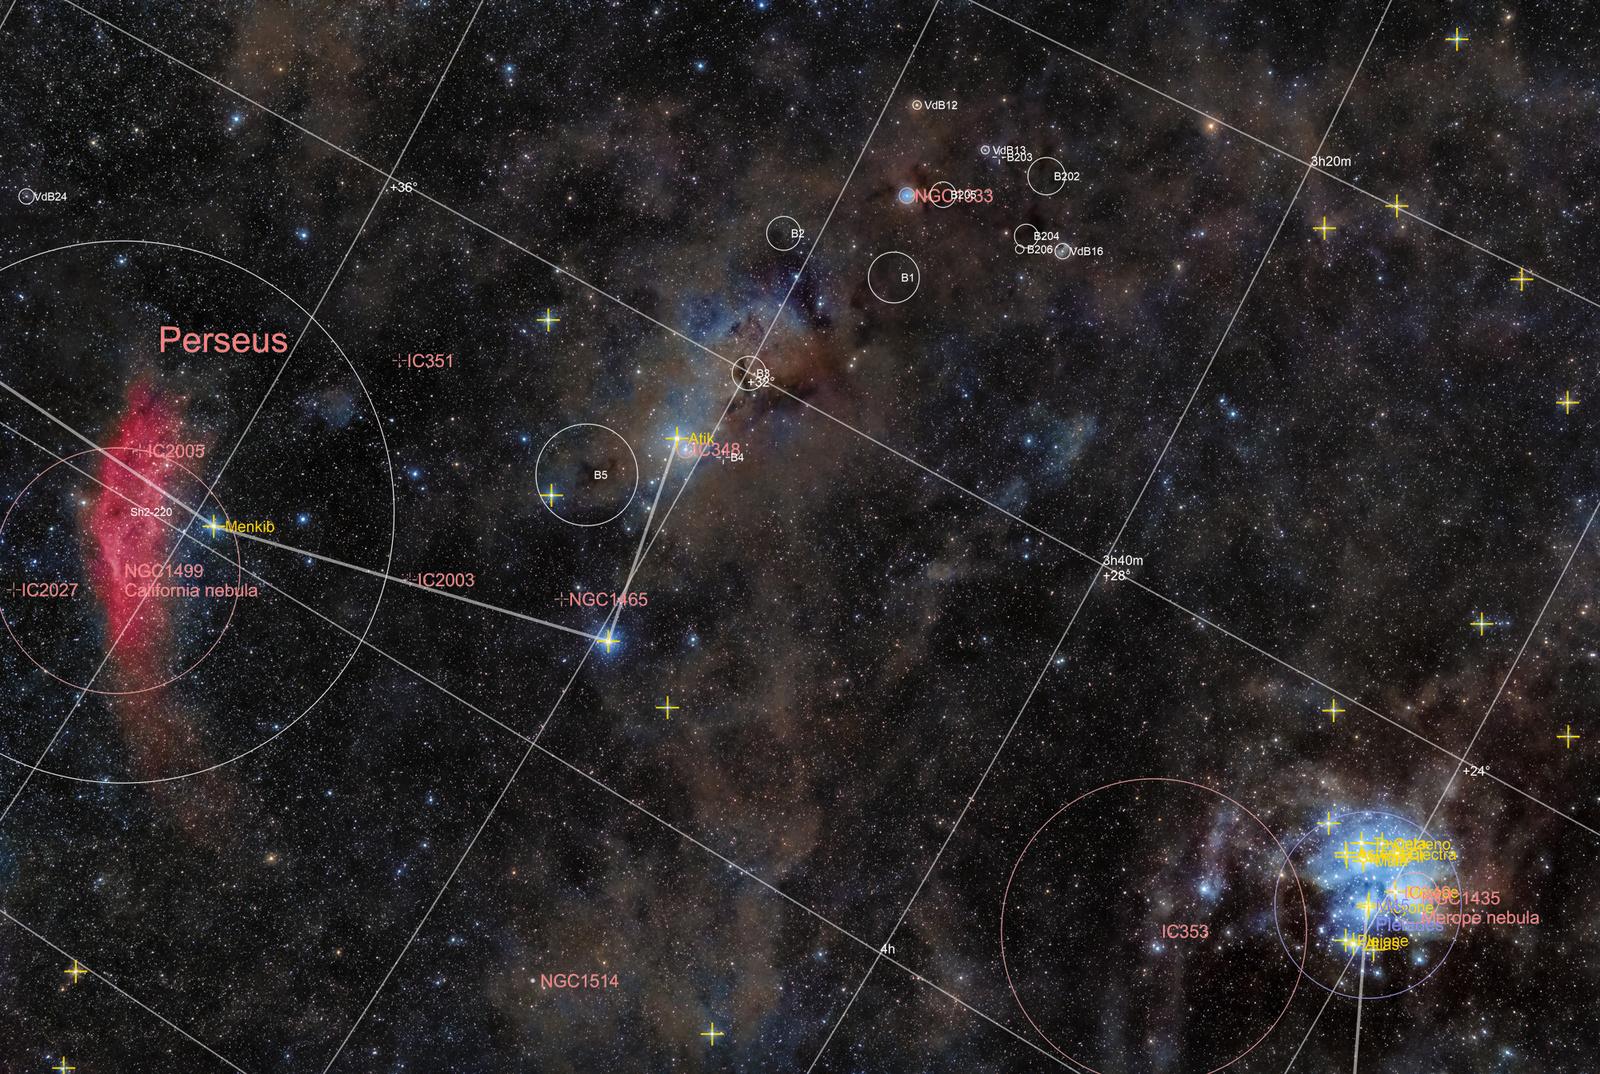 pleiades-persei-09i2000ano.thumb.jpg.5383c601e67039344400644eff02d2ad.jpg